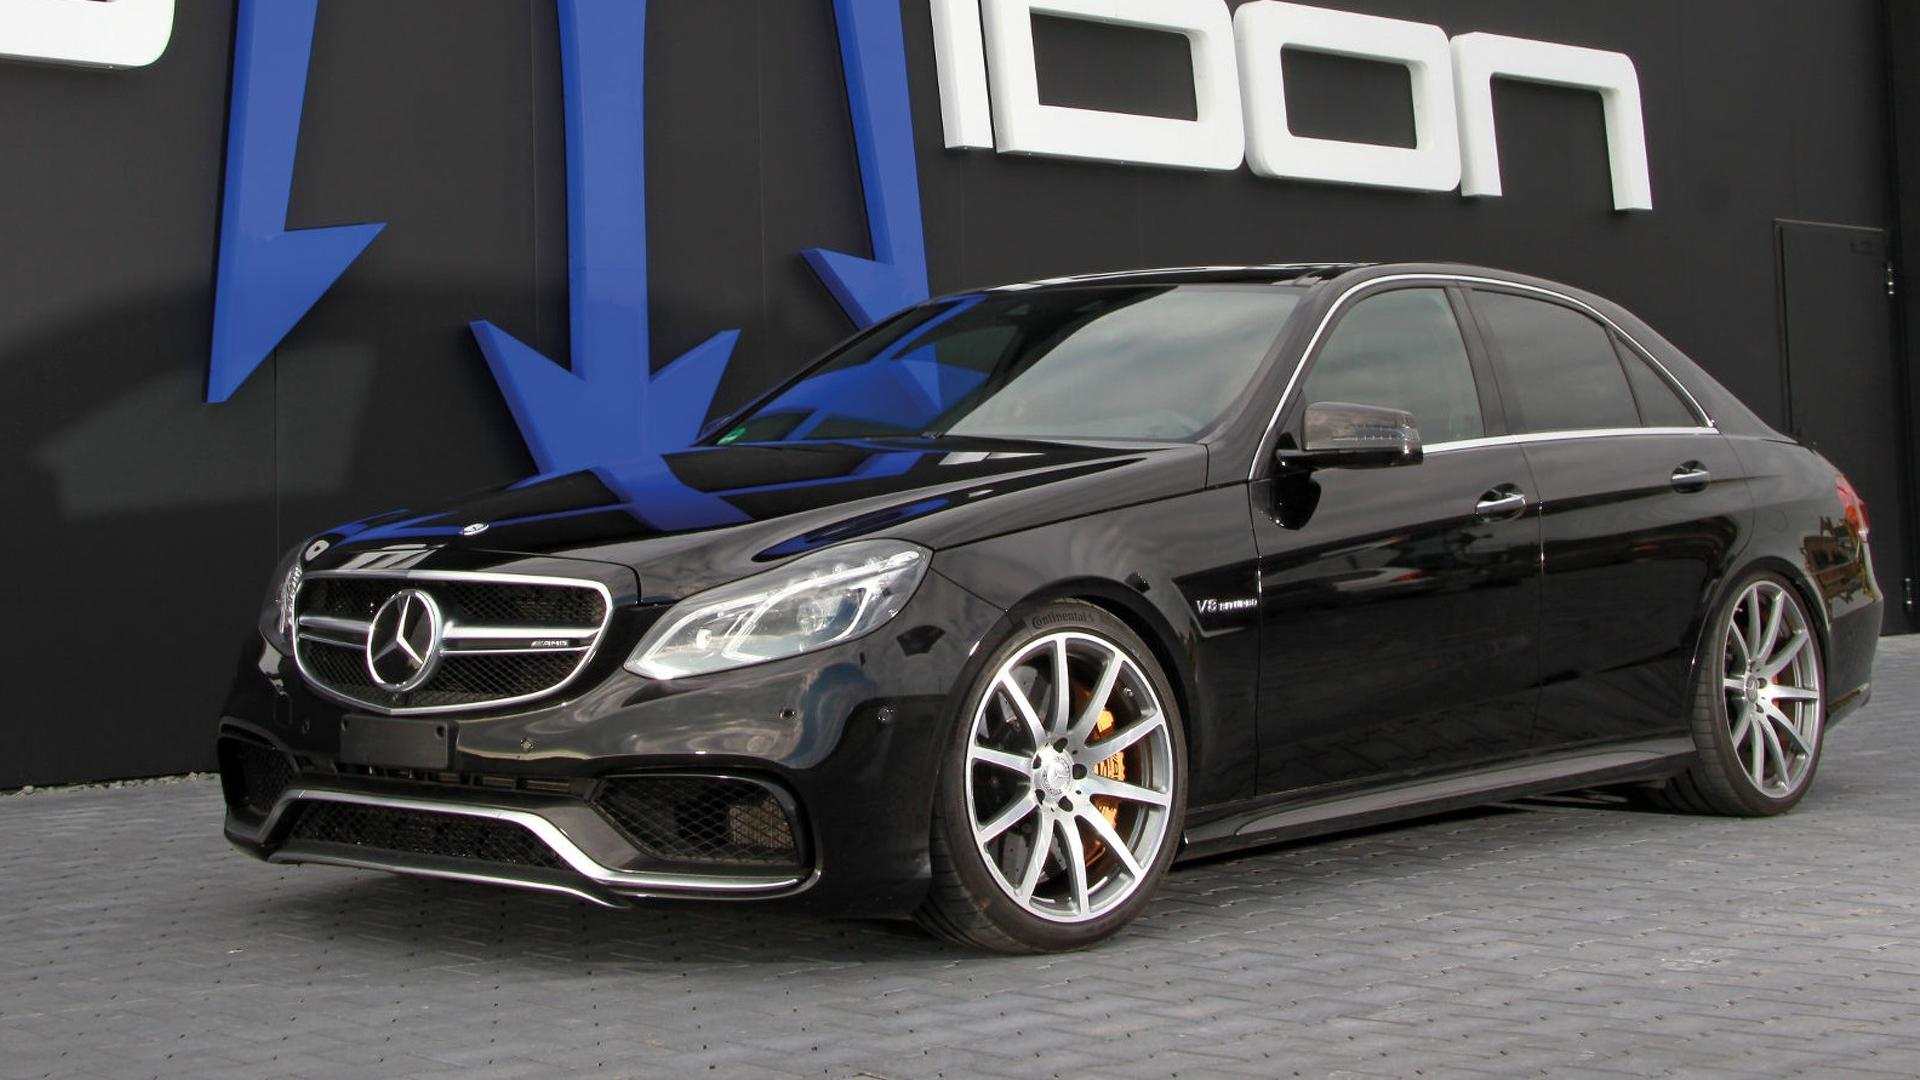 Mercedes E63 Amg >> Tuned Mercedes Amg E63 S Has More Power Than A Bugatti Veyron